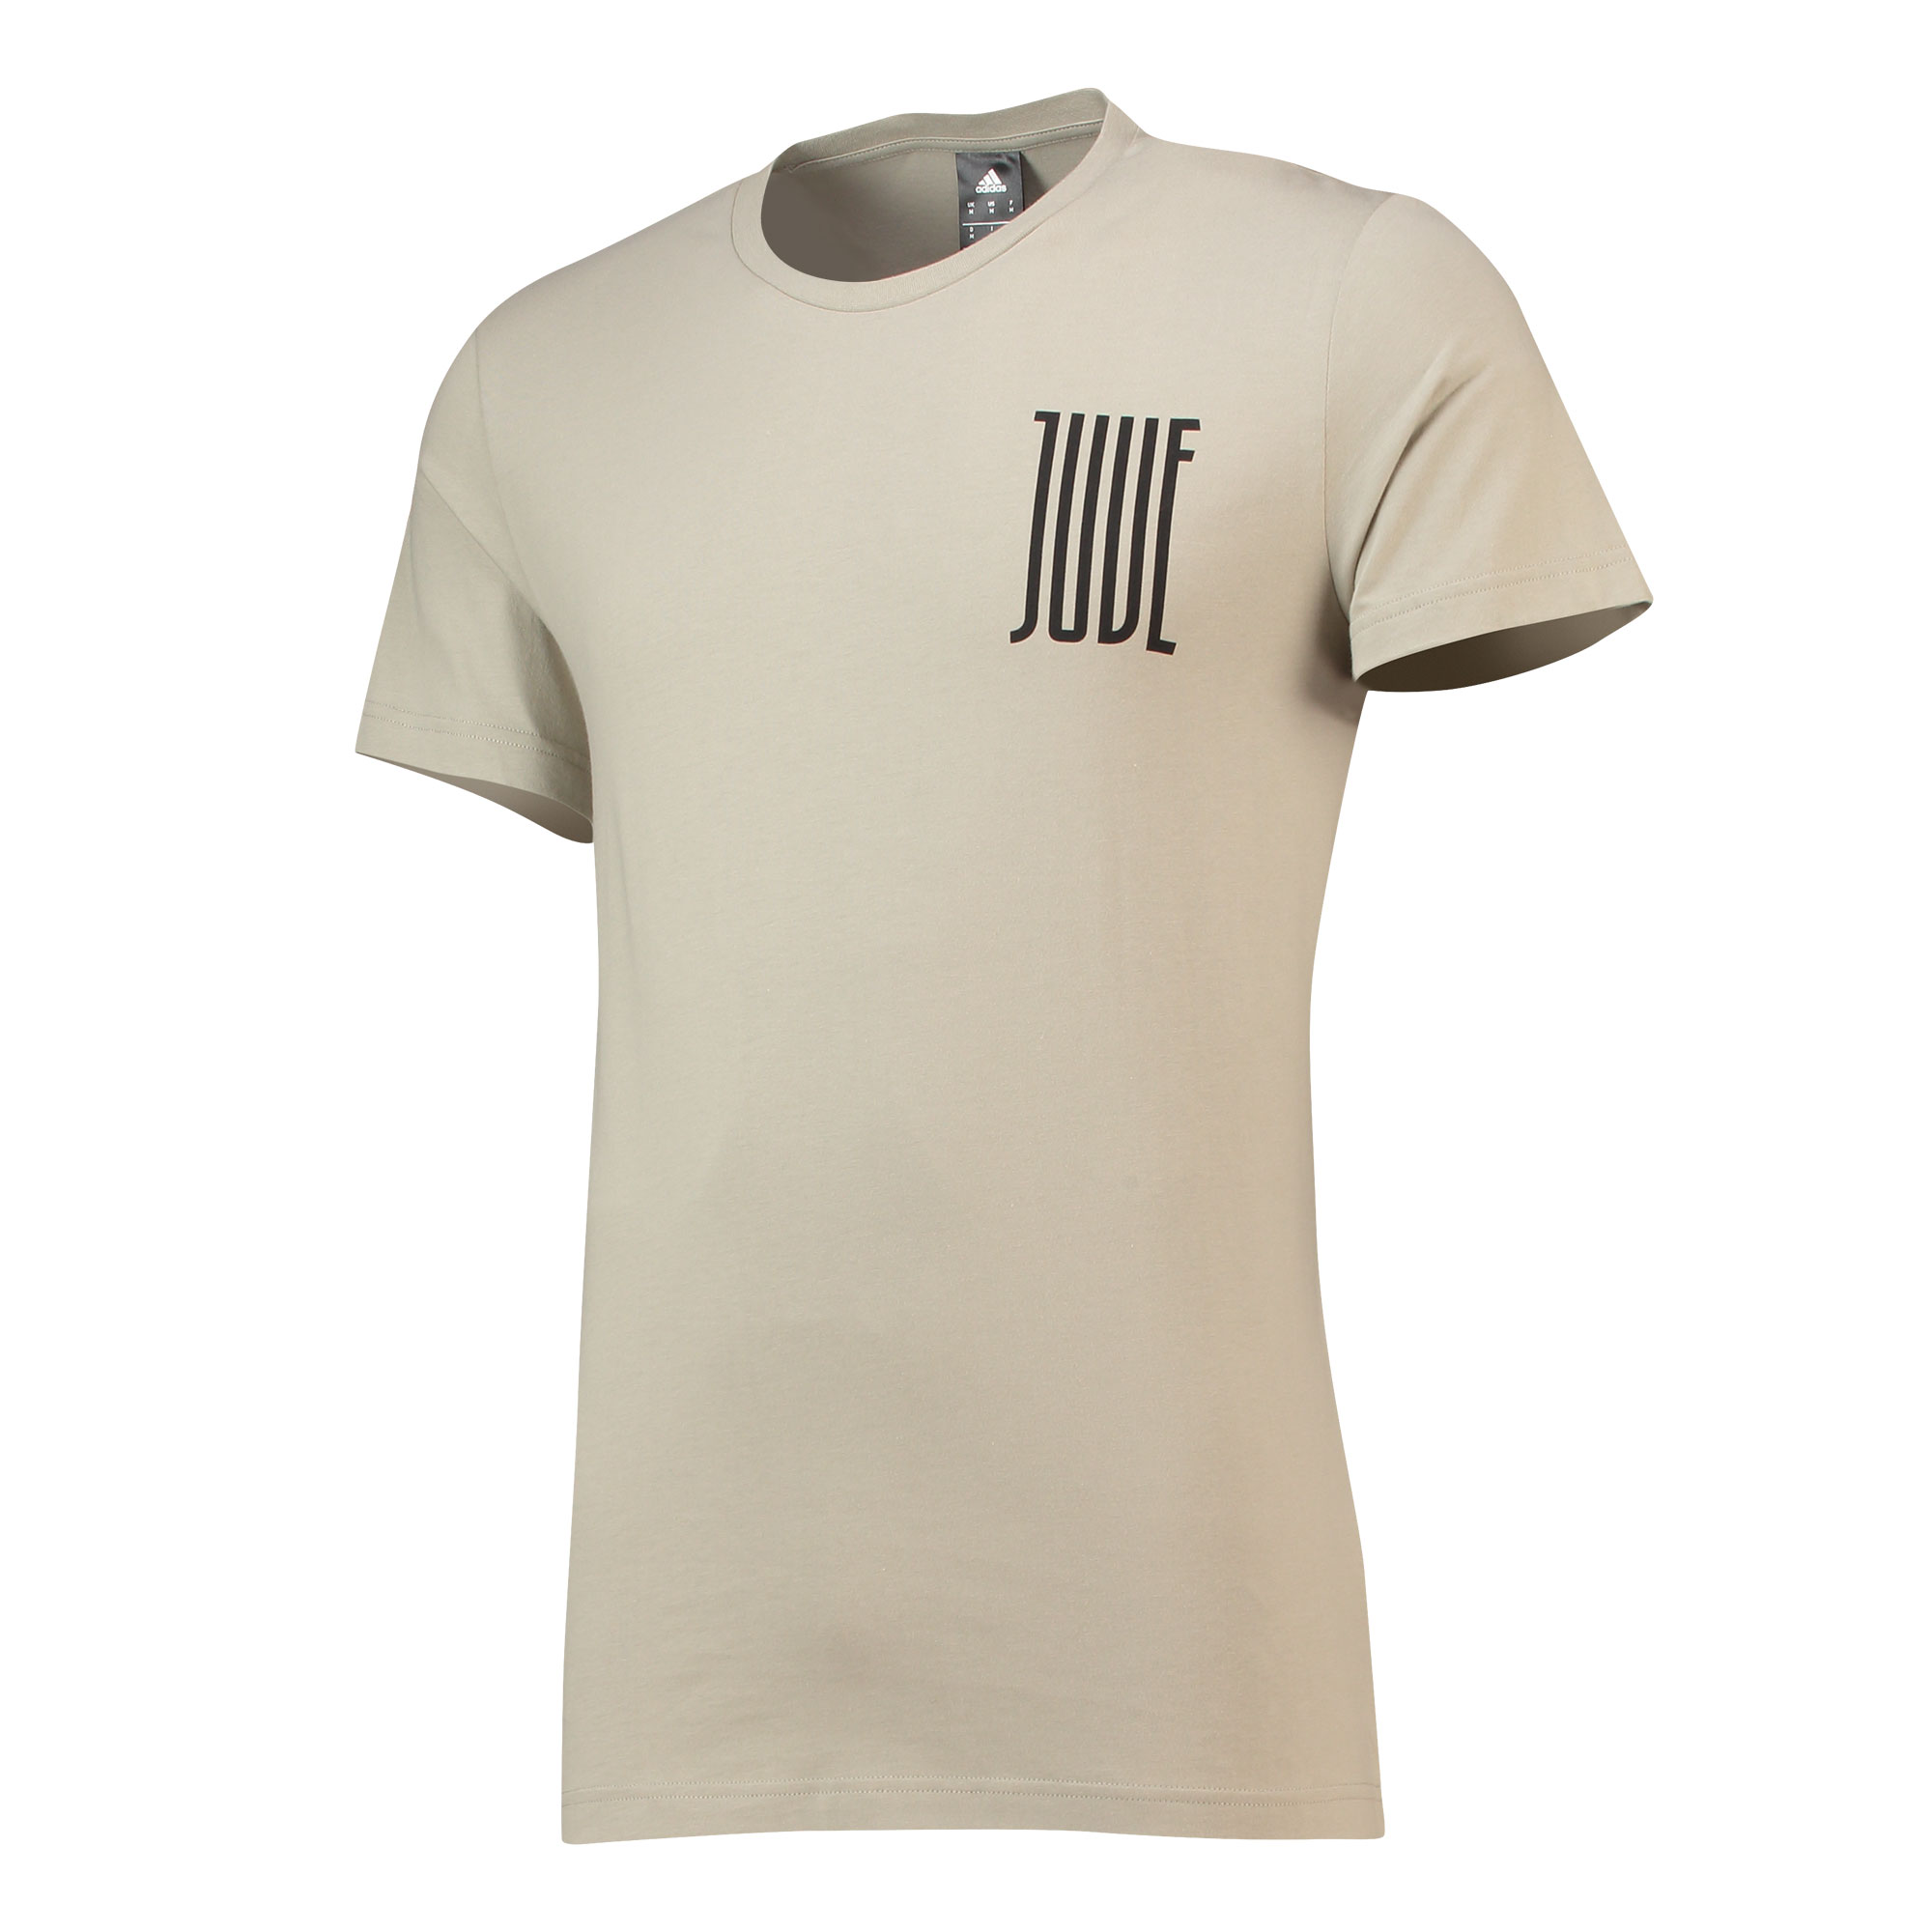 8cc3bbce2f75 Adidas Juventus tričko pánske